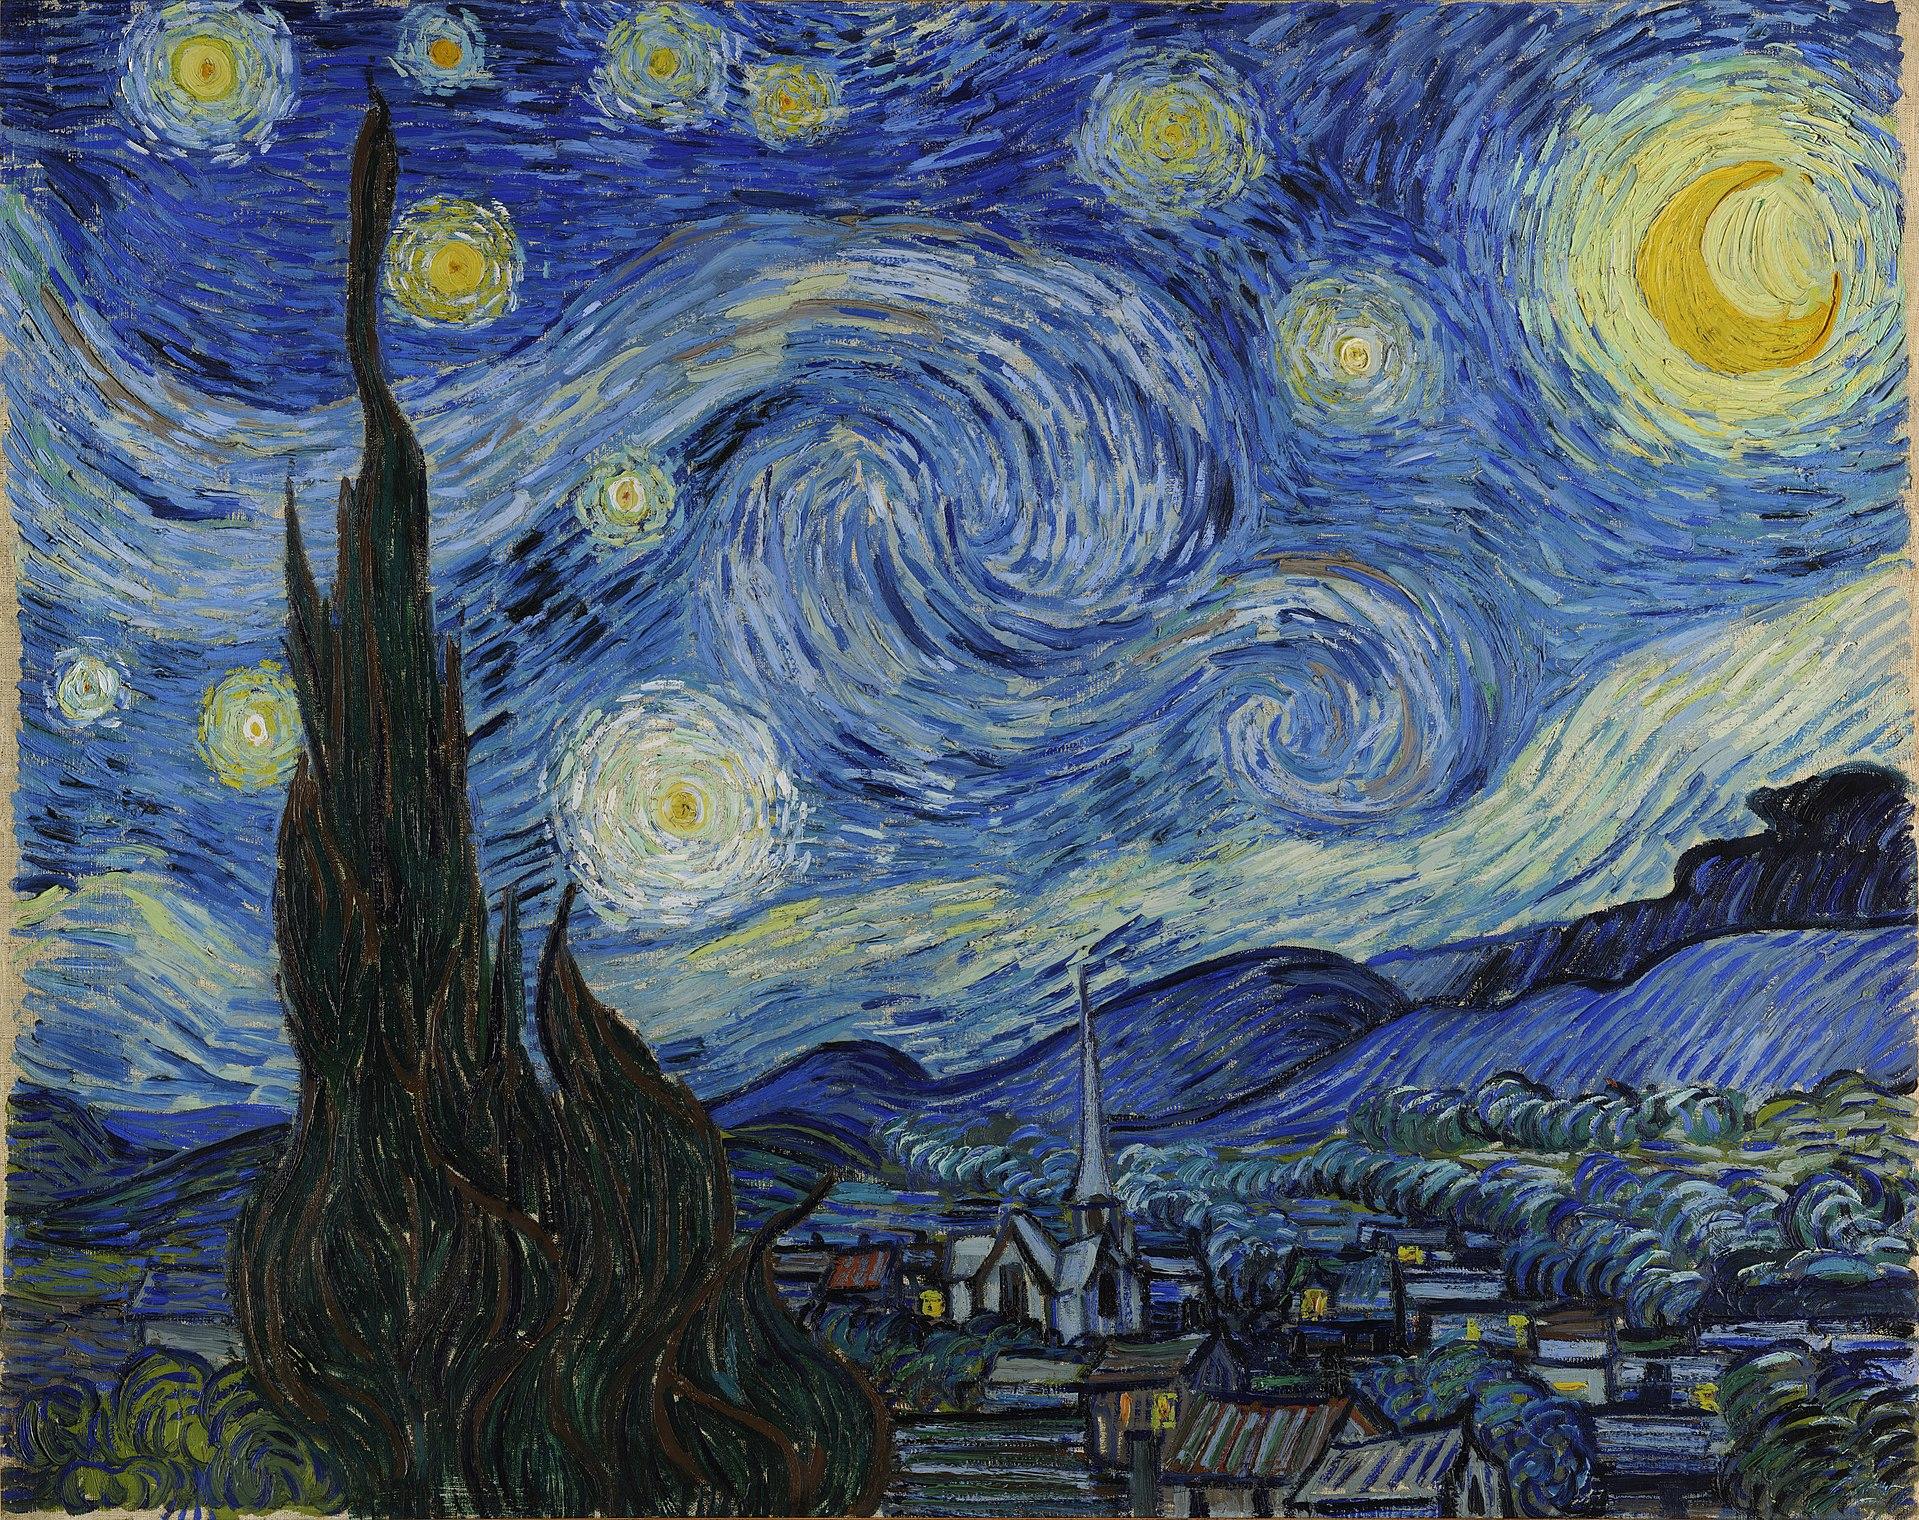 3. Notte stellata – Vincent Van Gogh (1889) – MOMA, New York